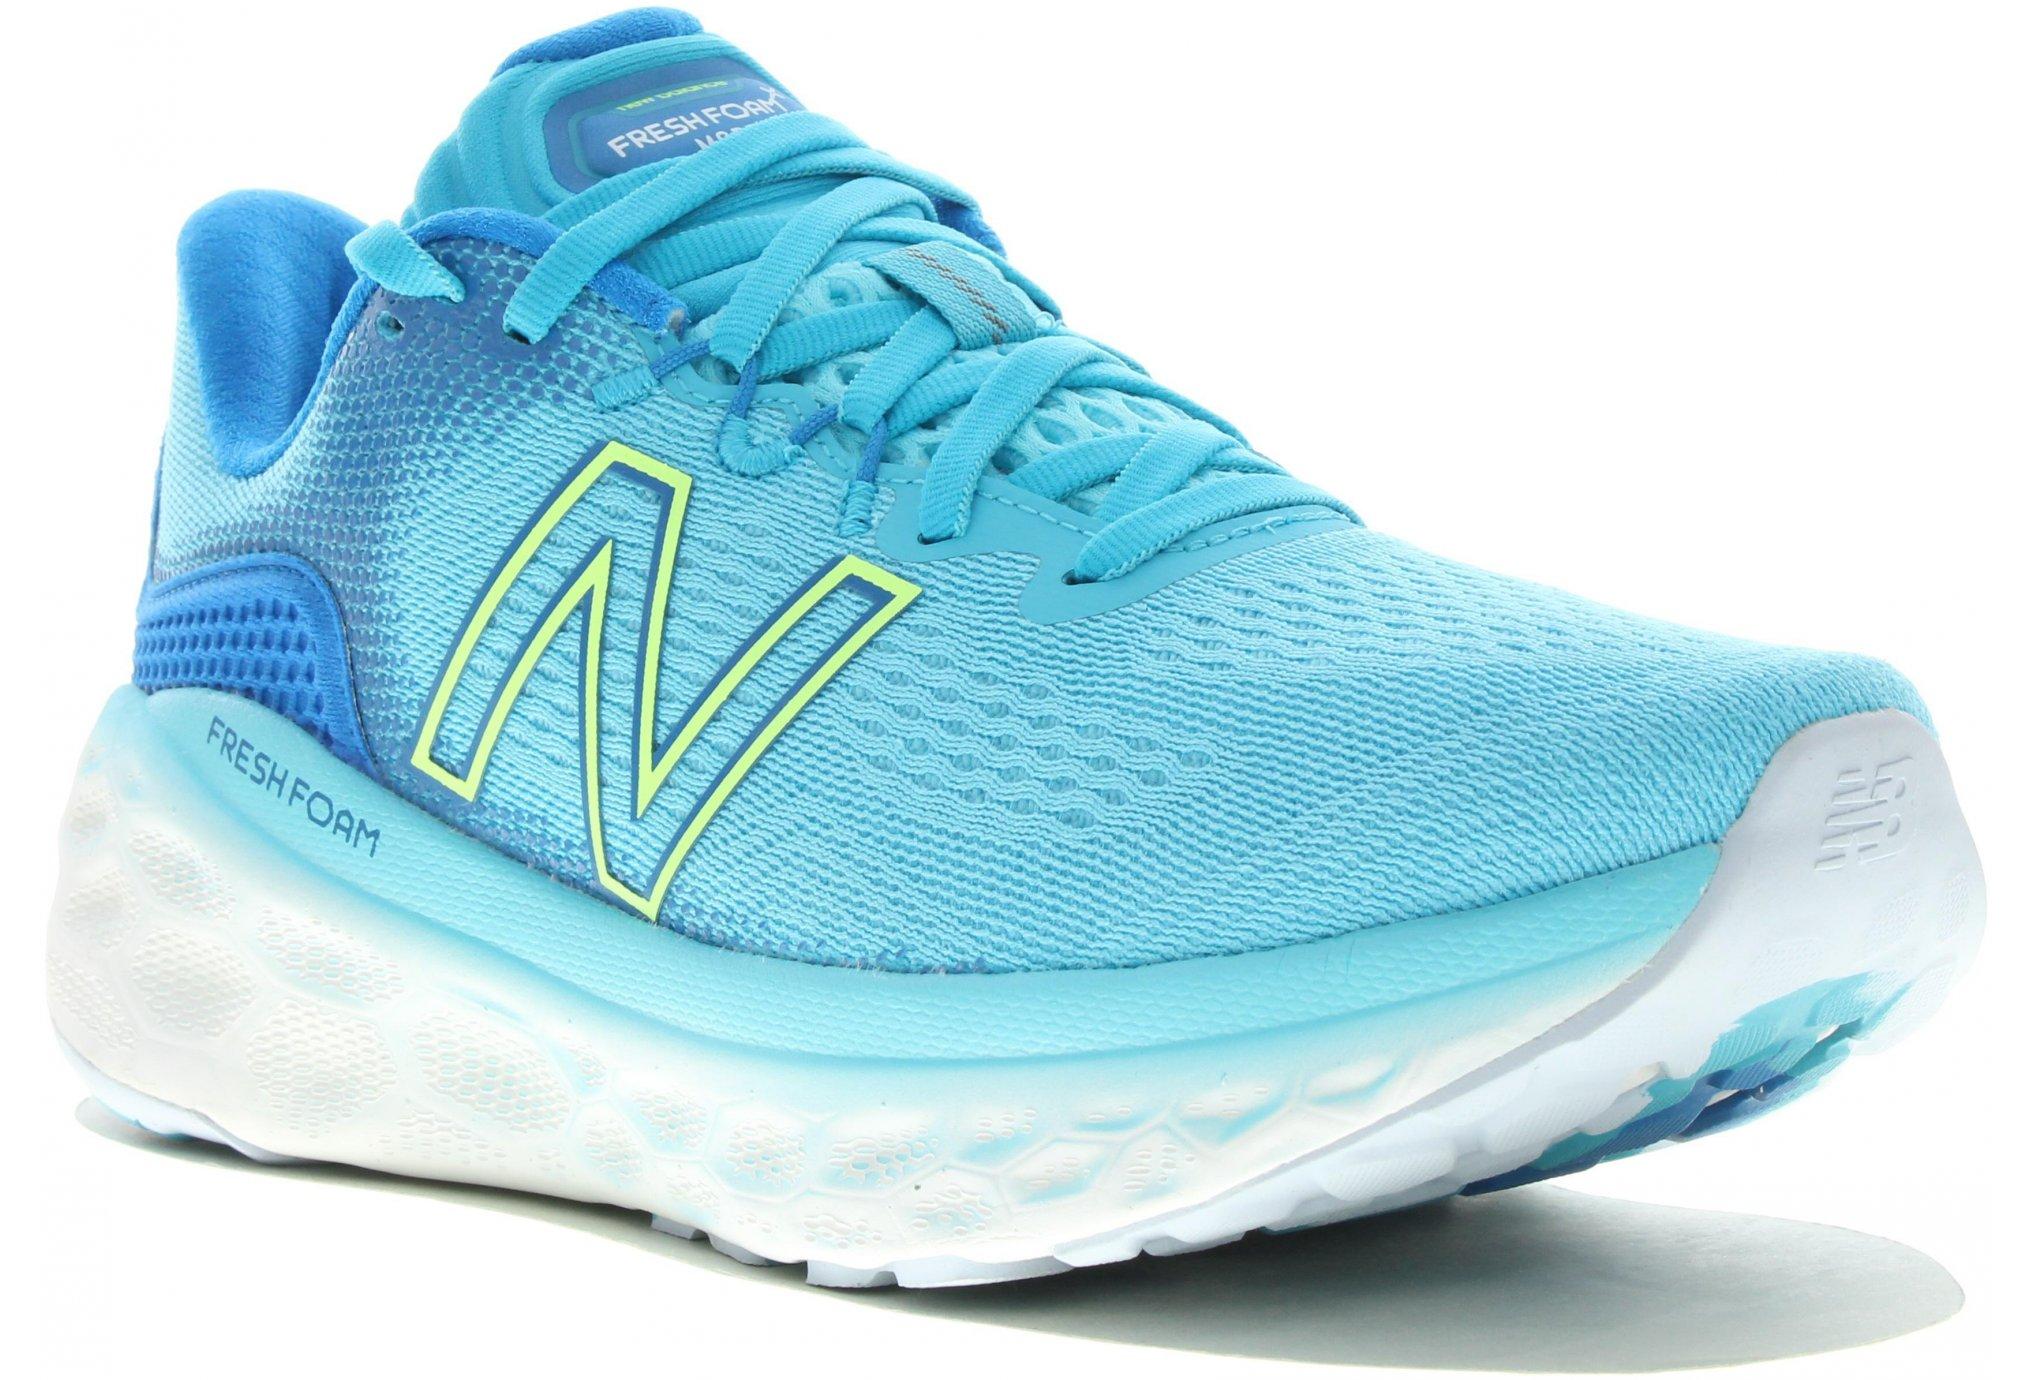 New Balance Fresh Foam More V3 W Chaussures running femme